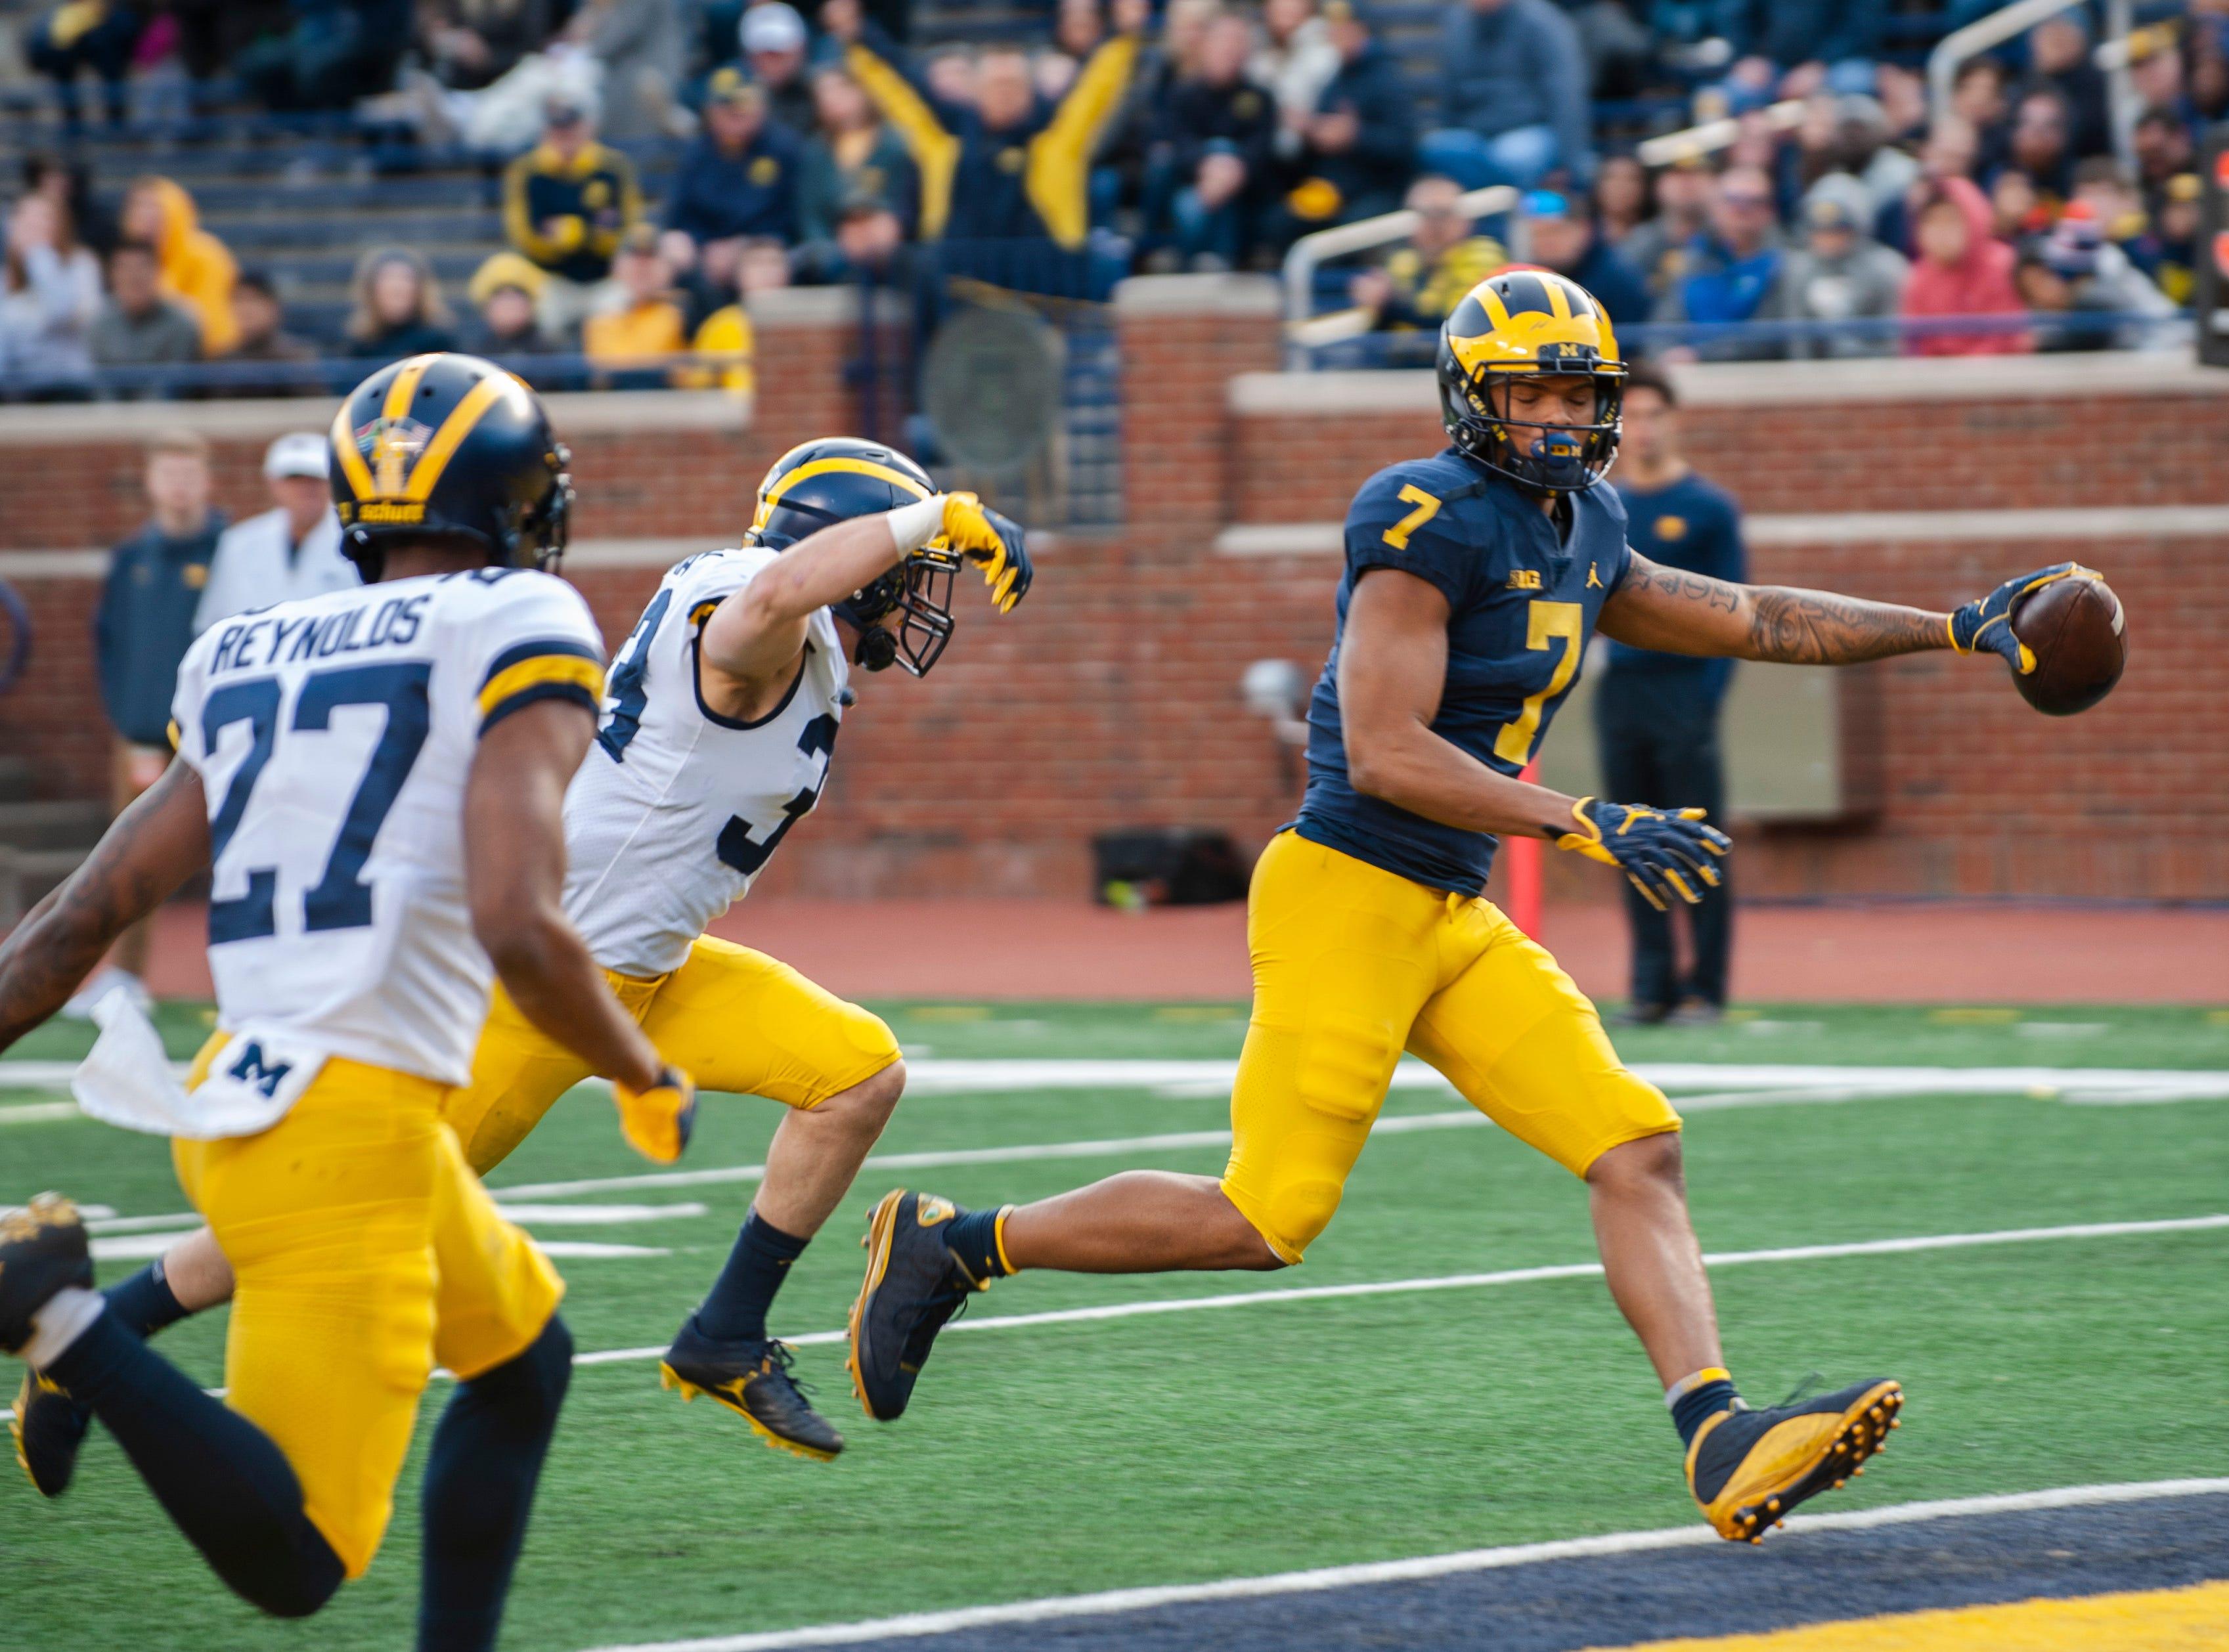 Michigan WR Tarik Black scores on a touchdown reception.